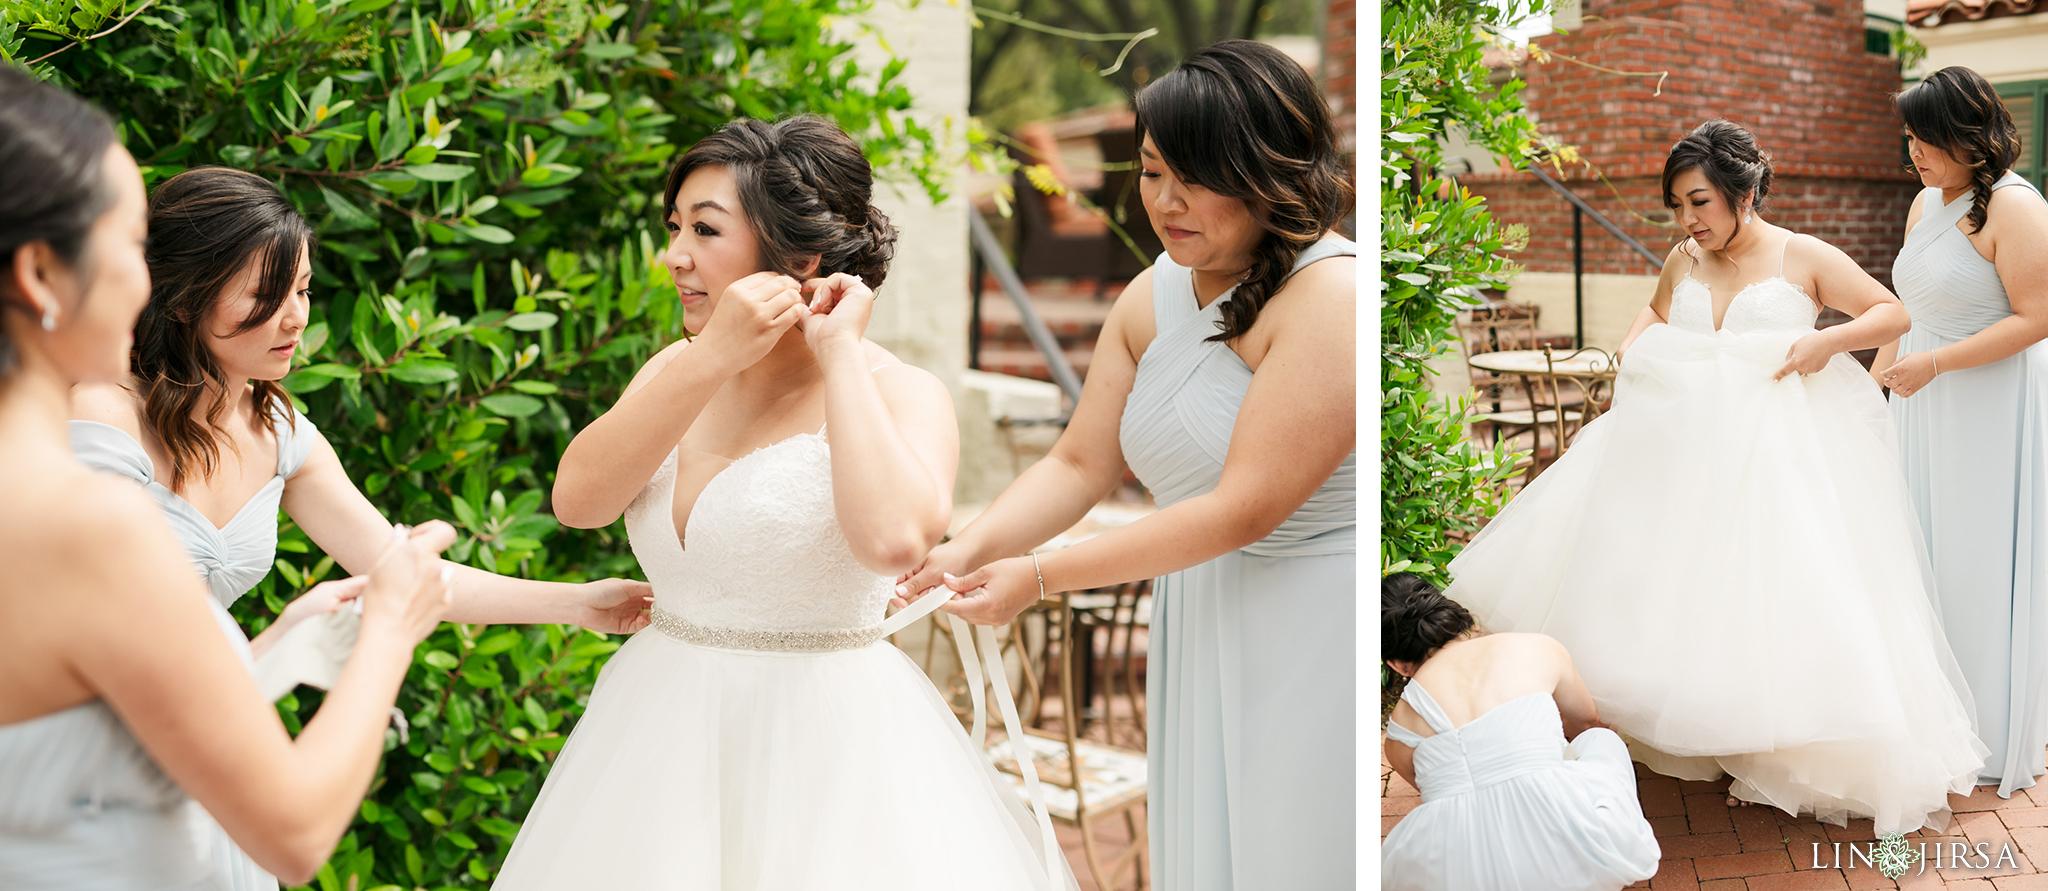 02 Padua Hills Claremont Wedding Photography